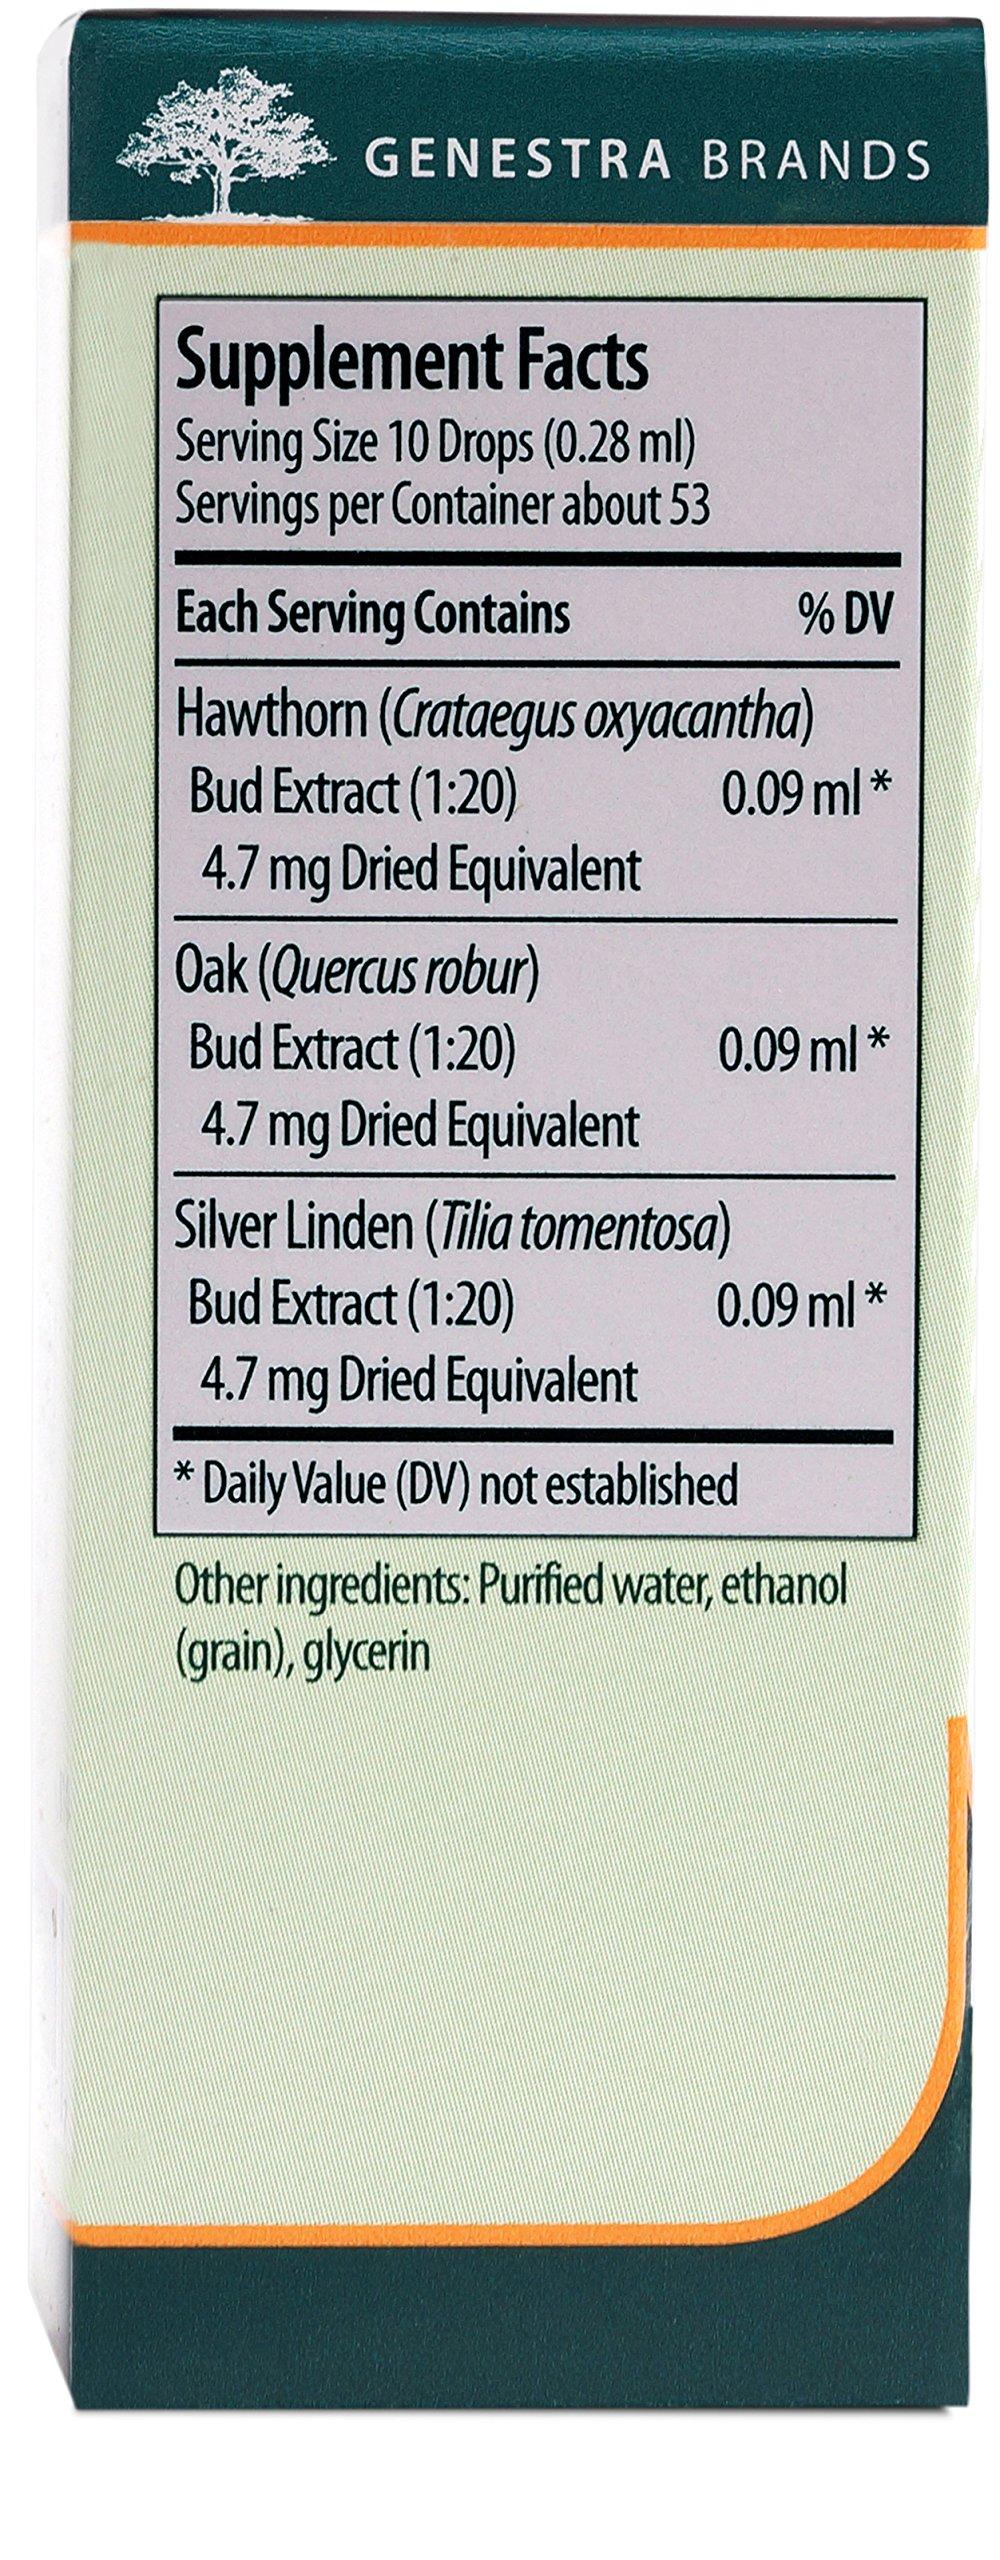 Genestra Brands - Renu-gen - Hawthorn, Oak, and Silver Linden Herbal Supplement - 0.5 fl. oz. by Genestra Brands (Image #2)